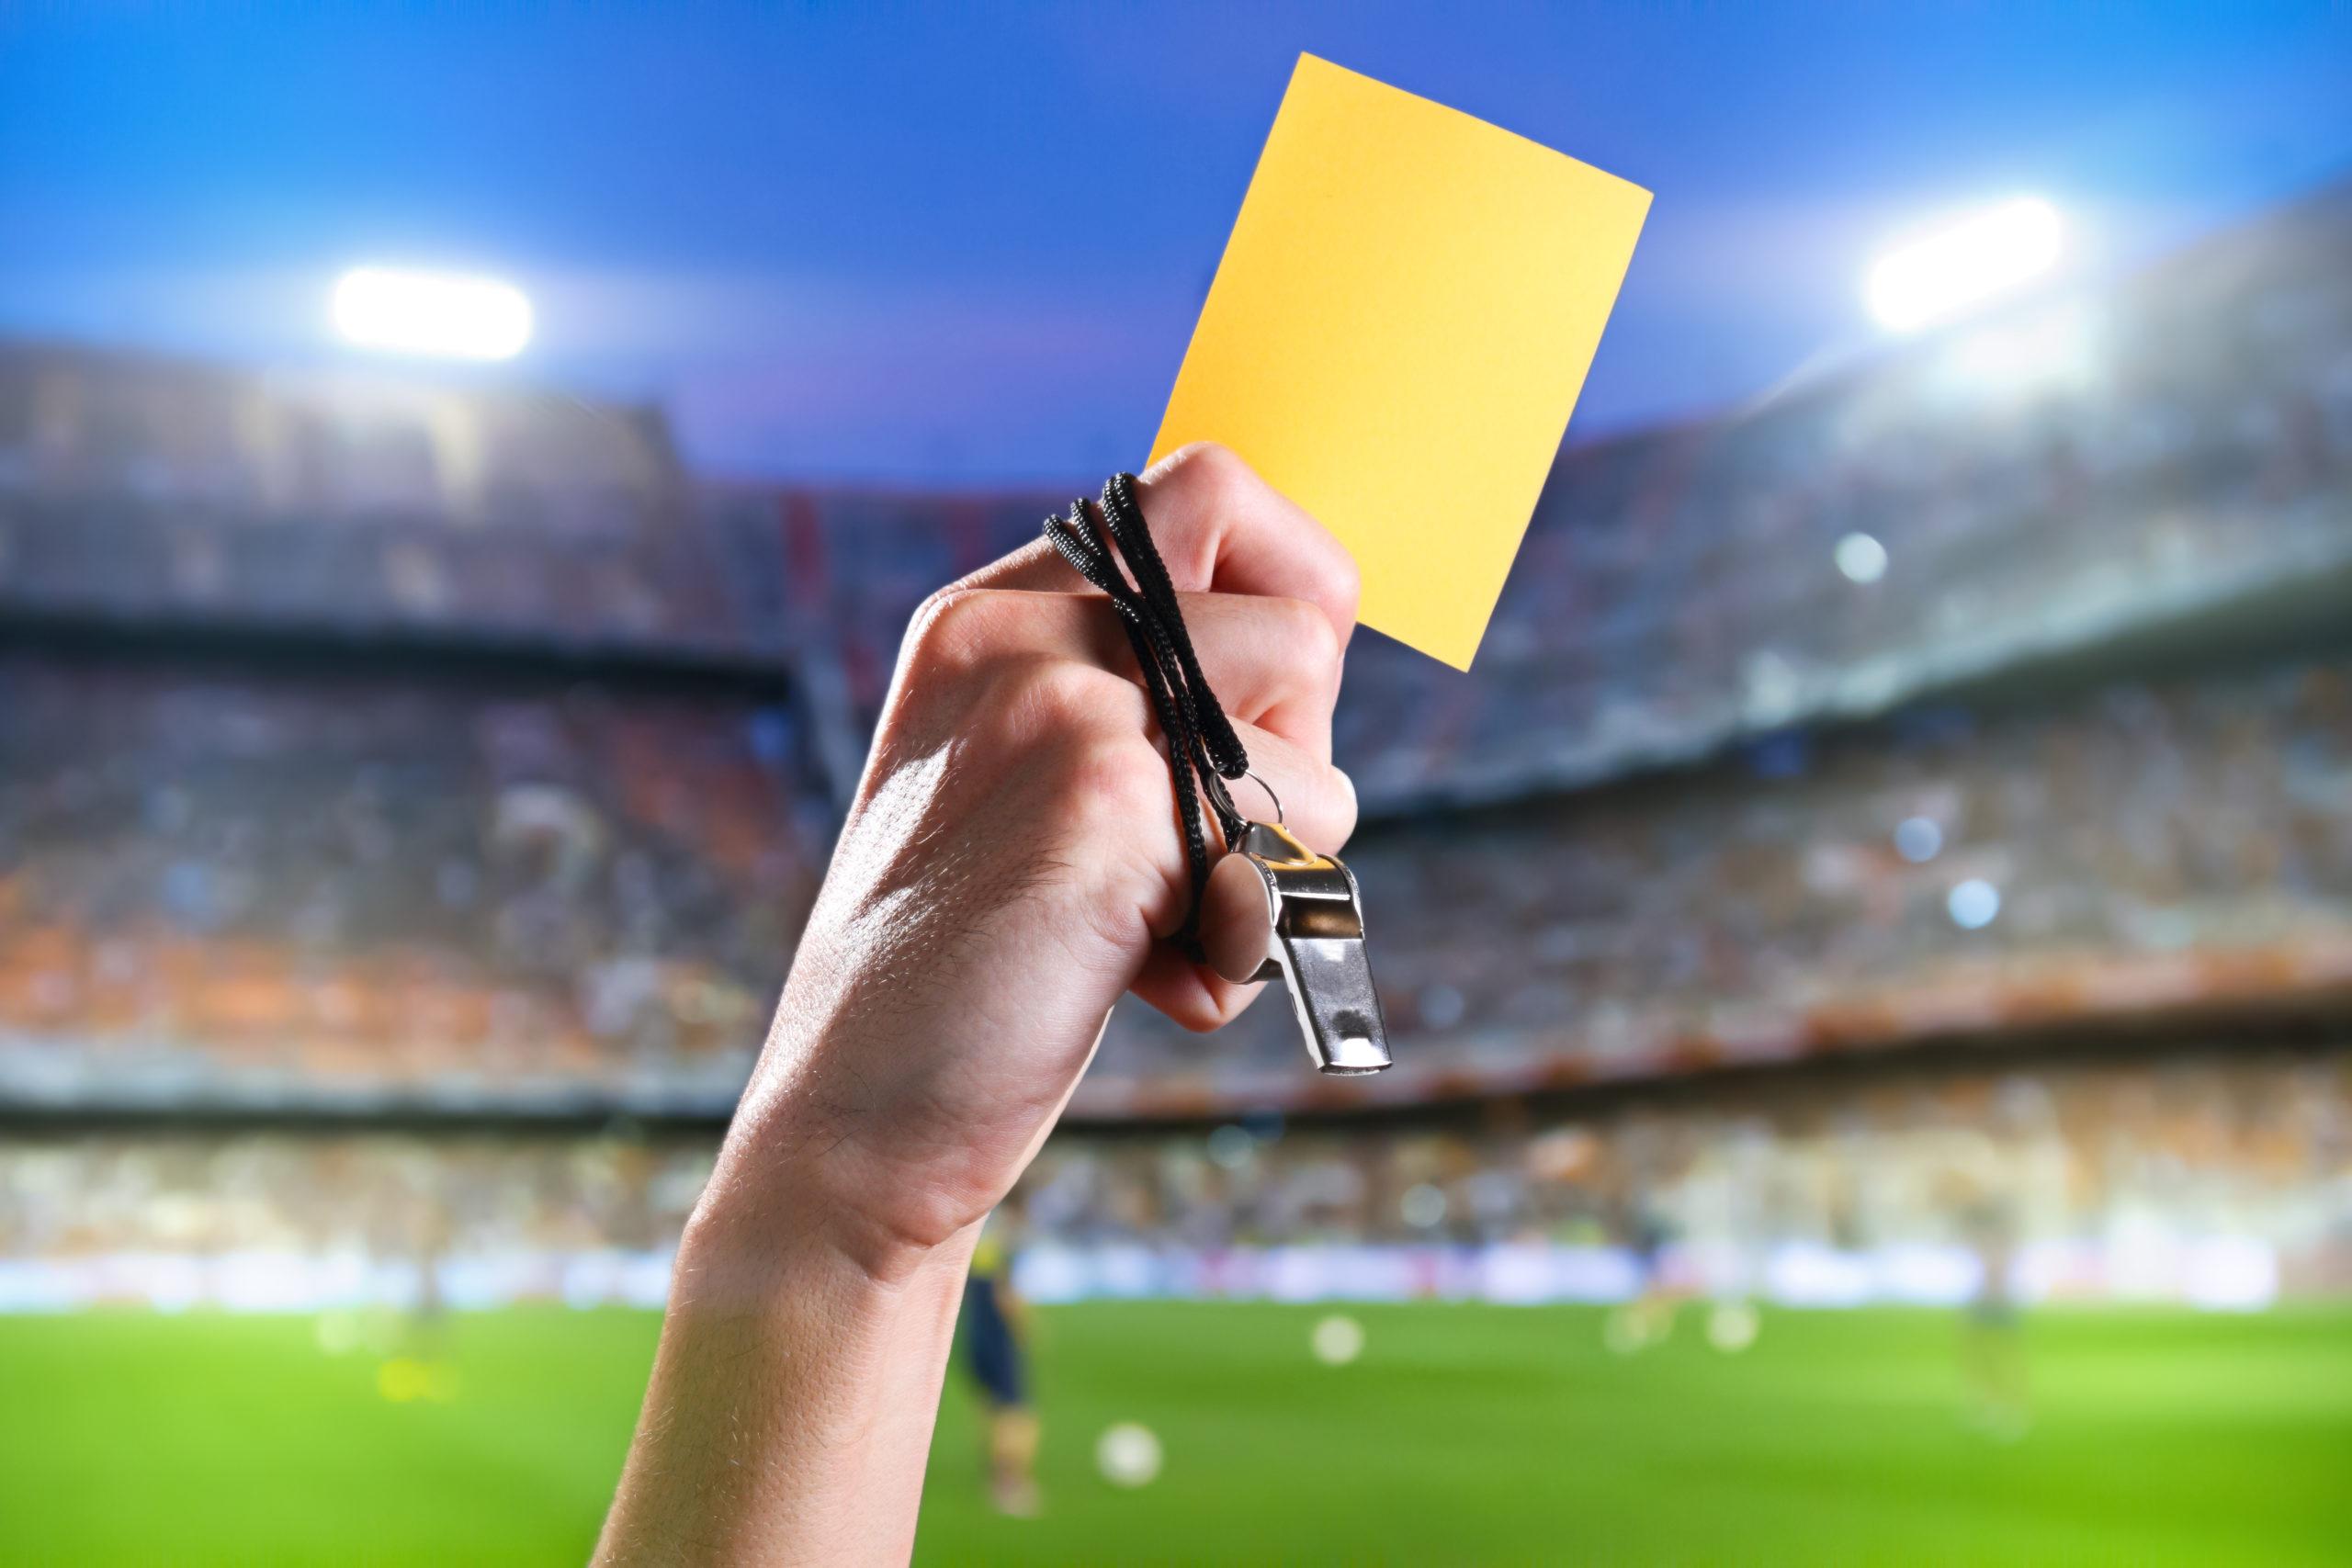 gelbe-rote-karten-wette